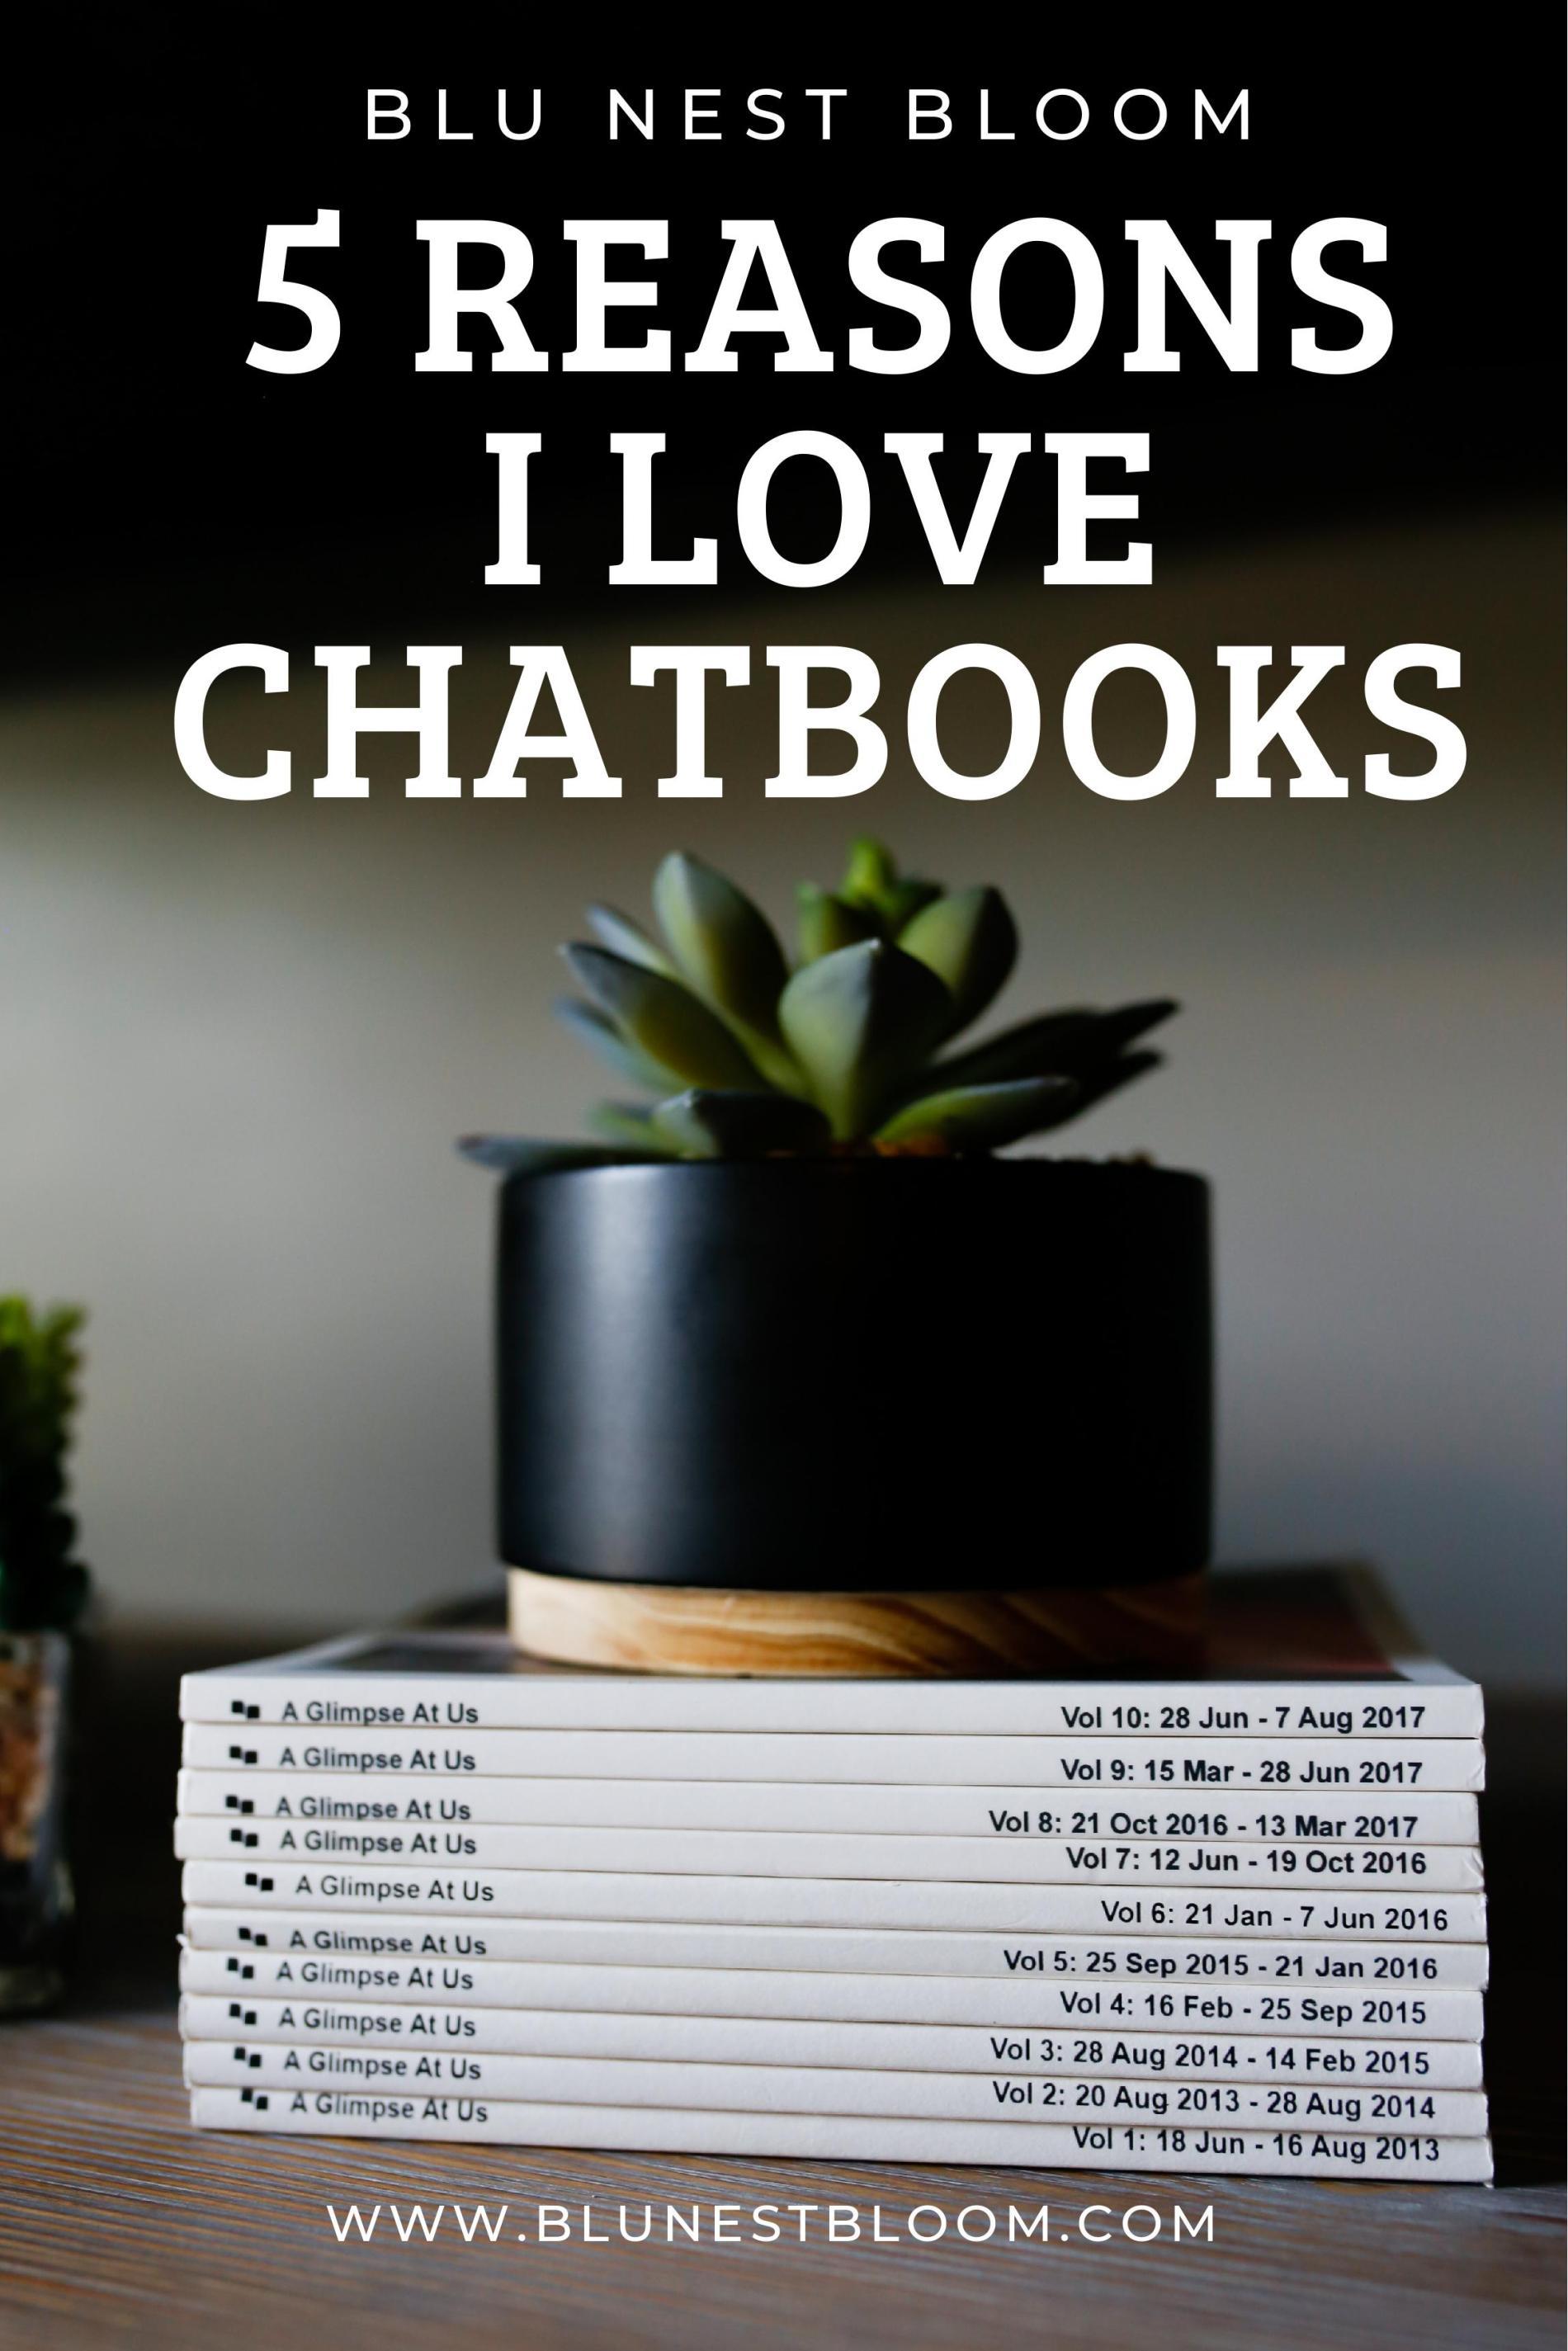 pinterest image with stack of chatbooks photobooks